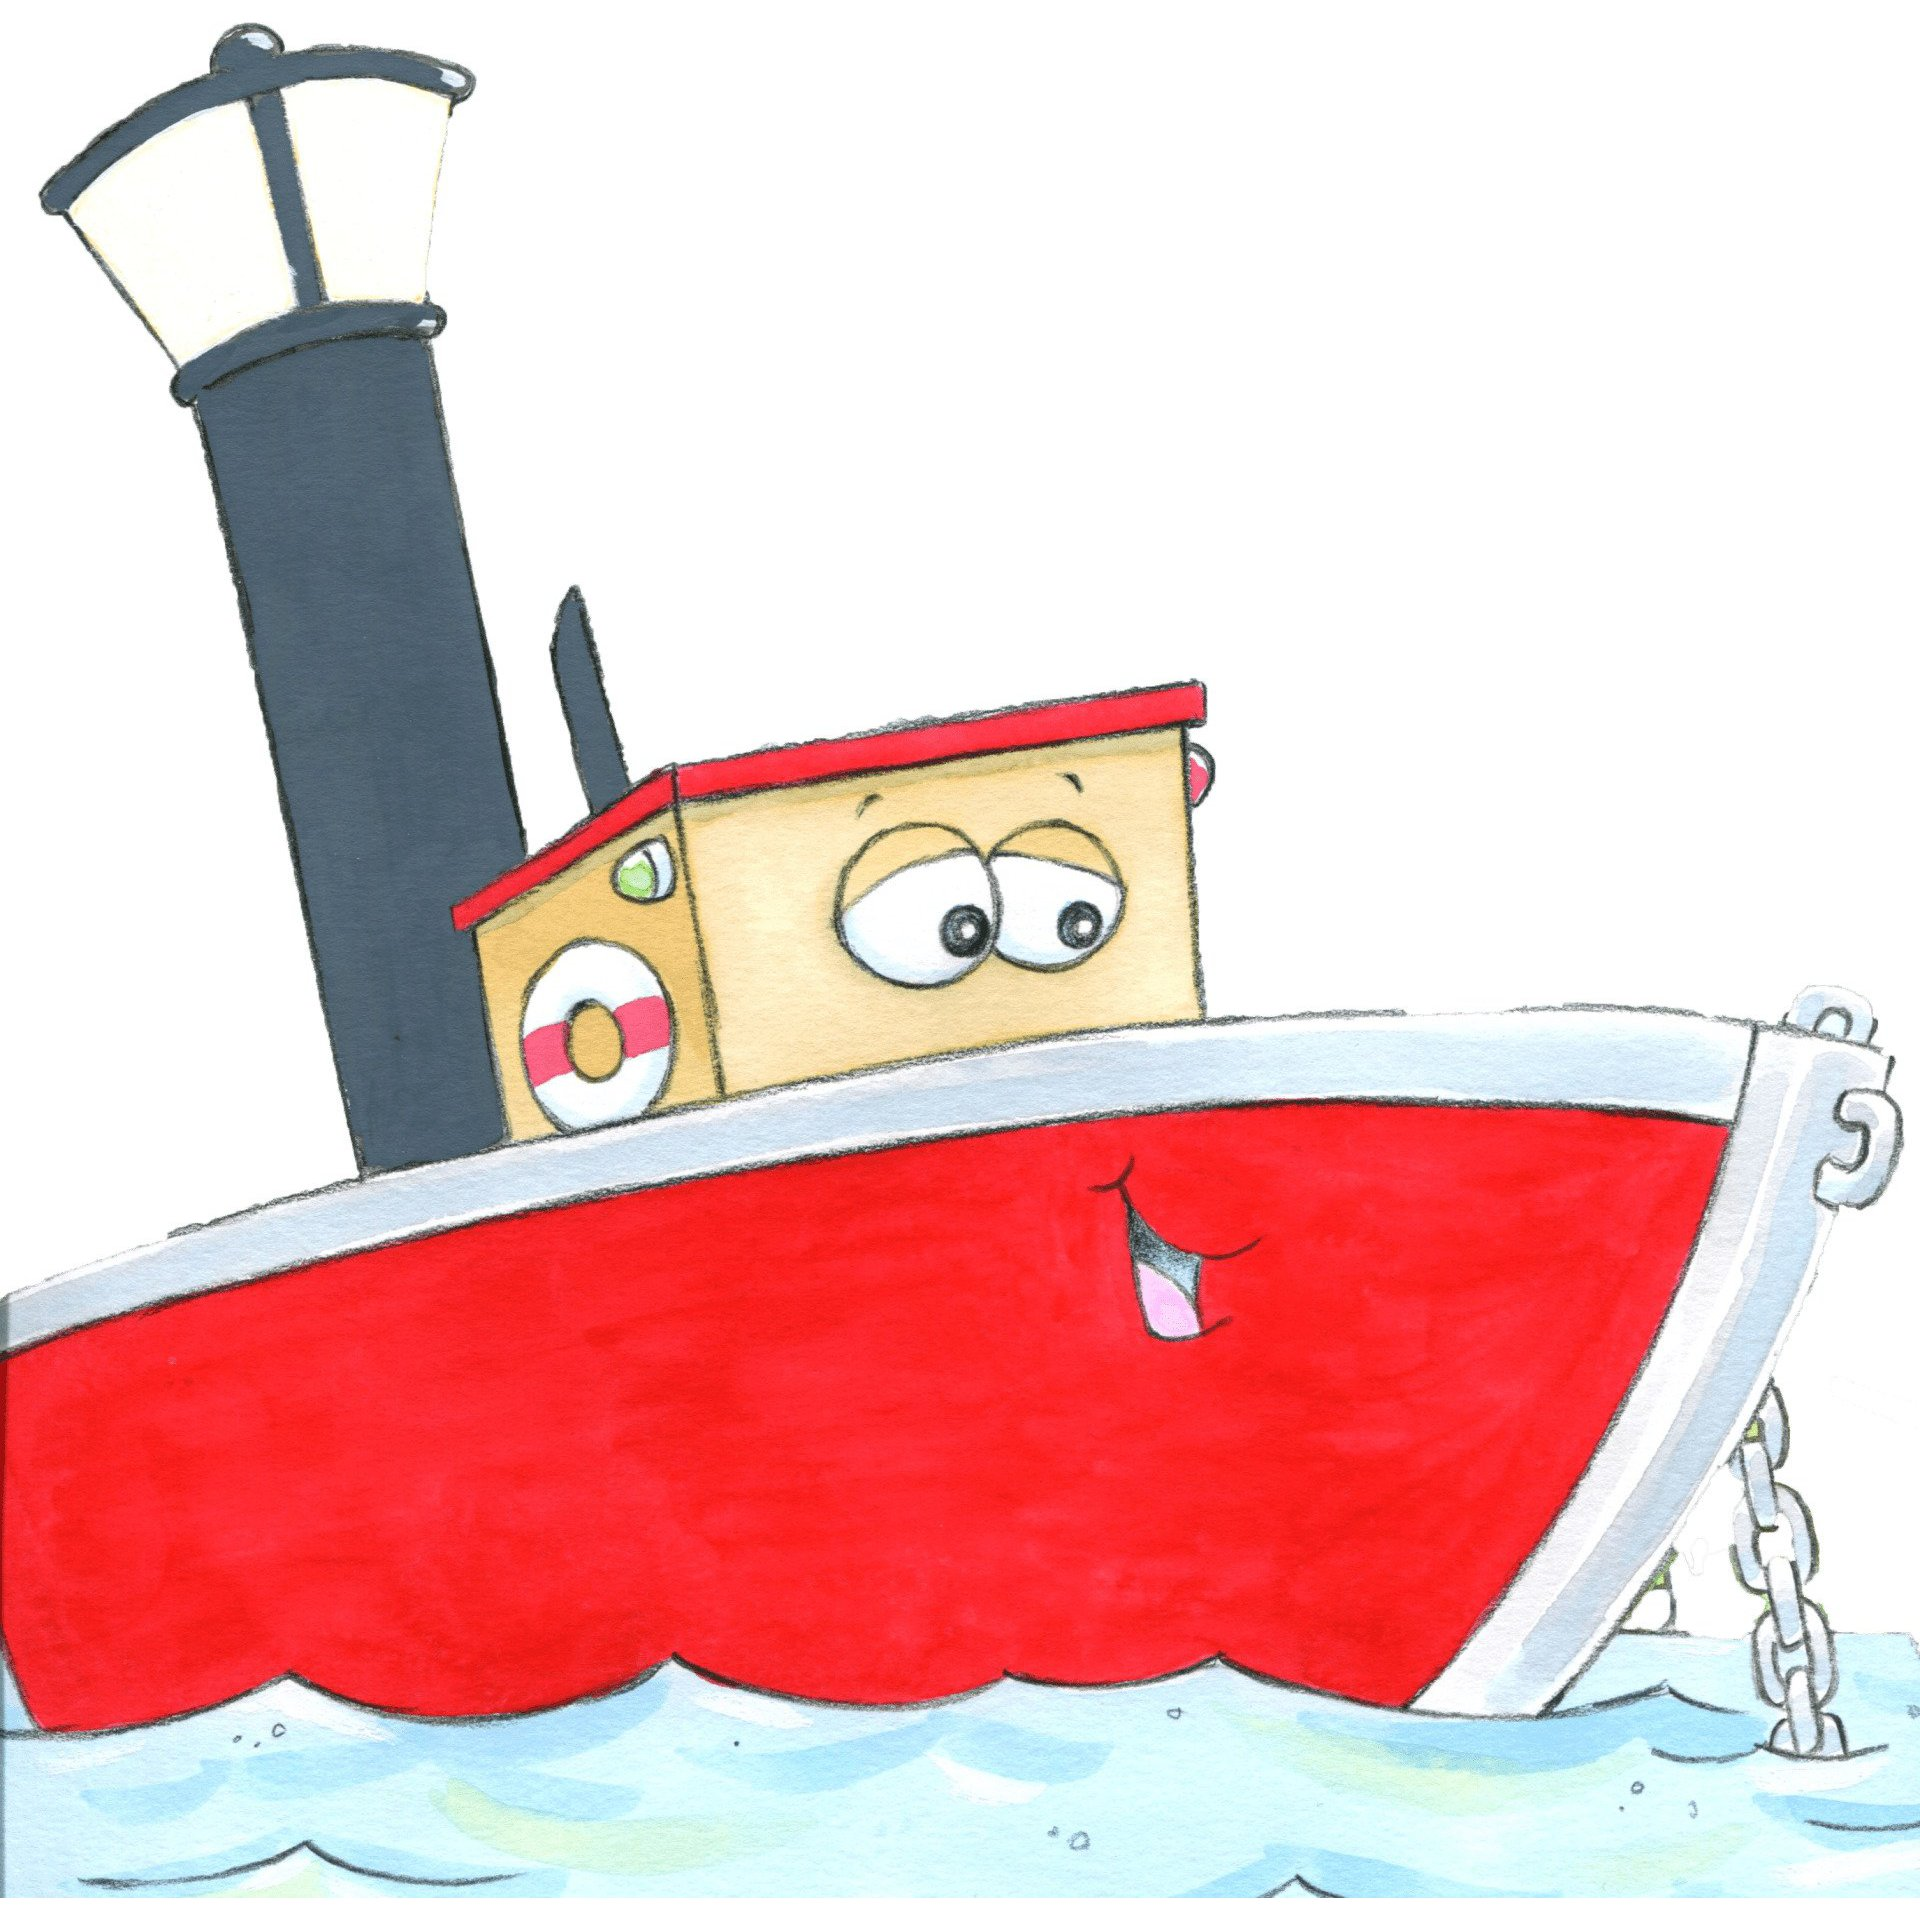 PJ The Lifeboat